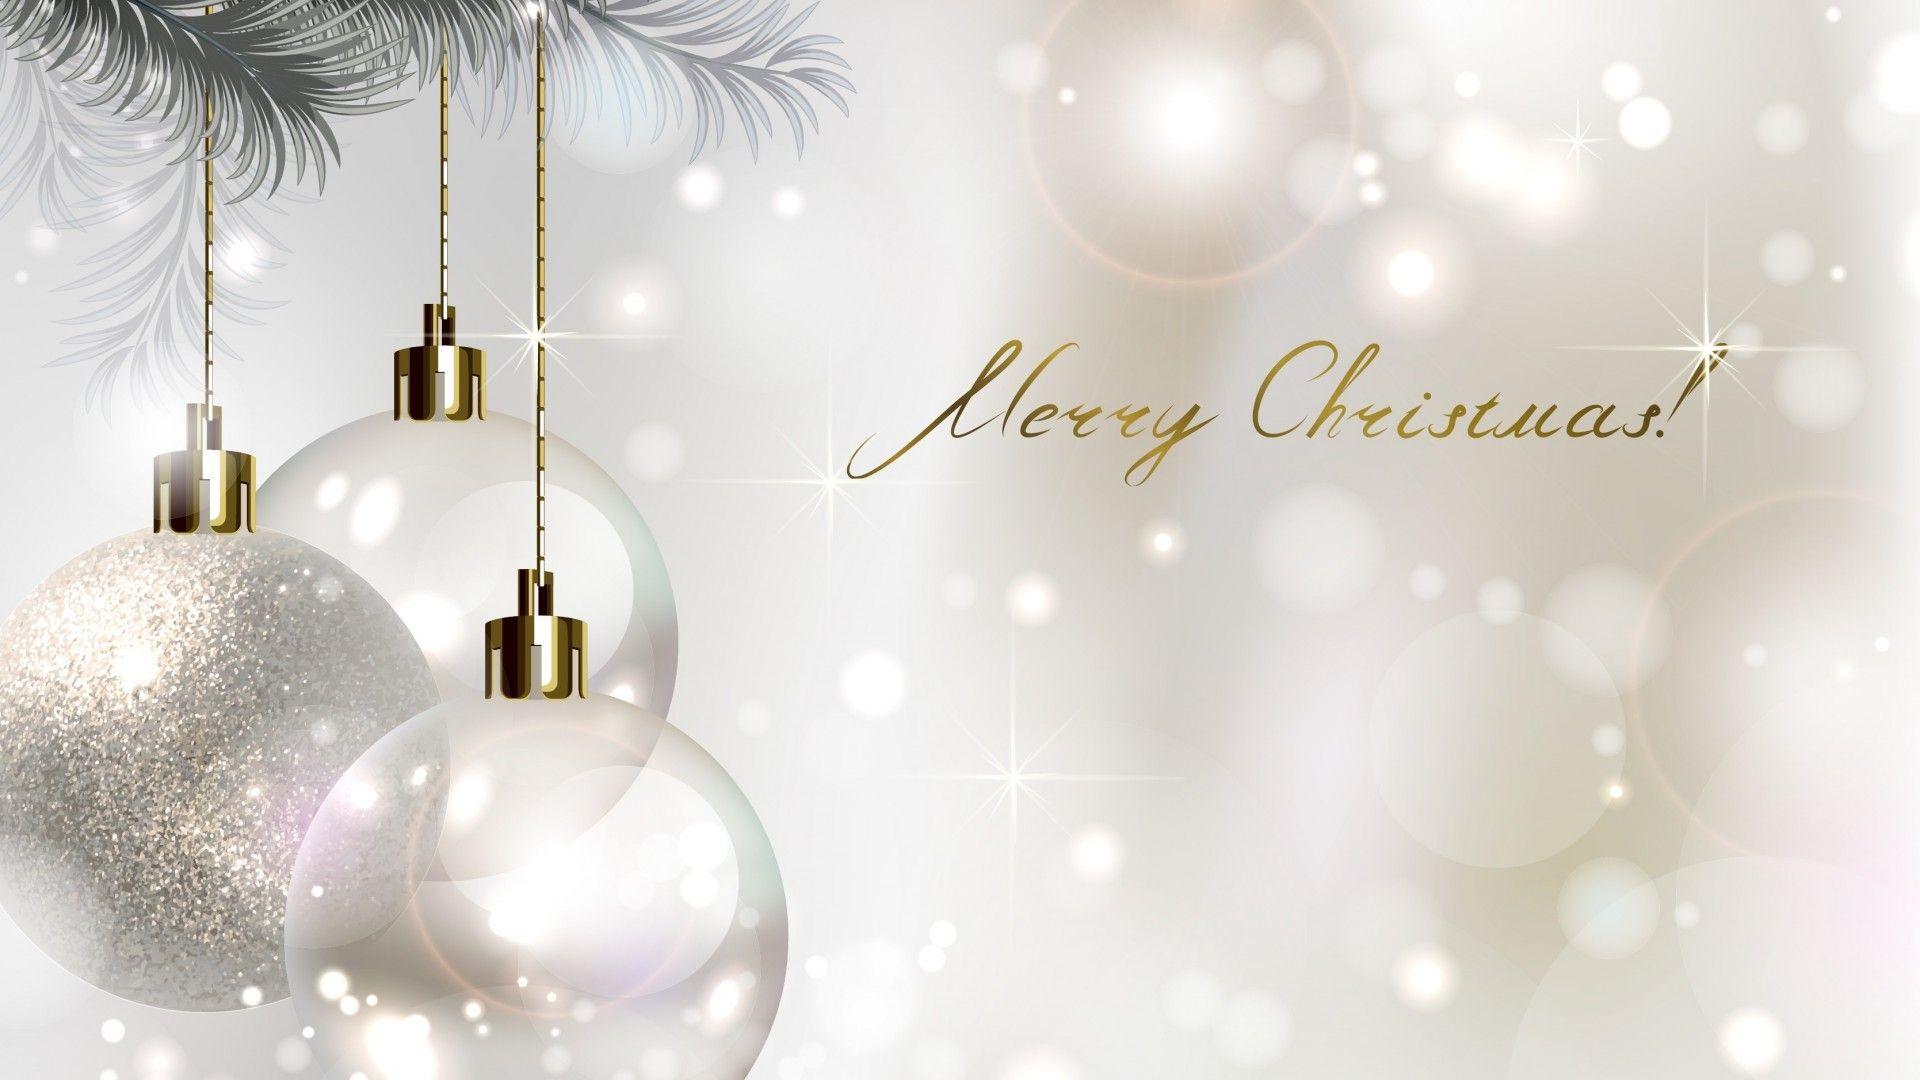 Merry Christmas Wallpaper Images Merry Christmas Wallpaper Christmas Wallpaper Hd Christmas Desktop Wallpaper